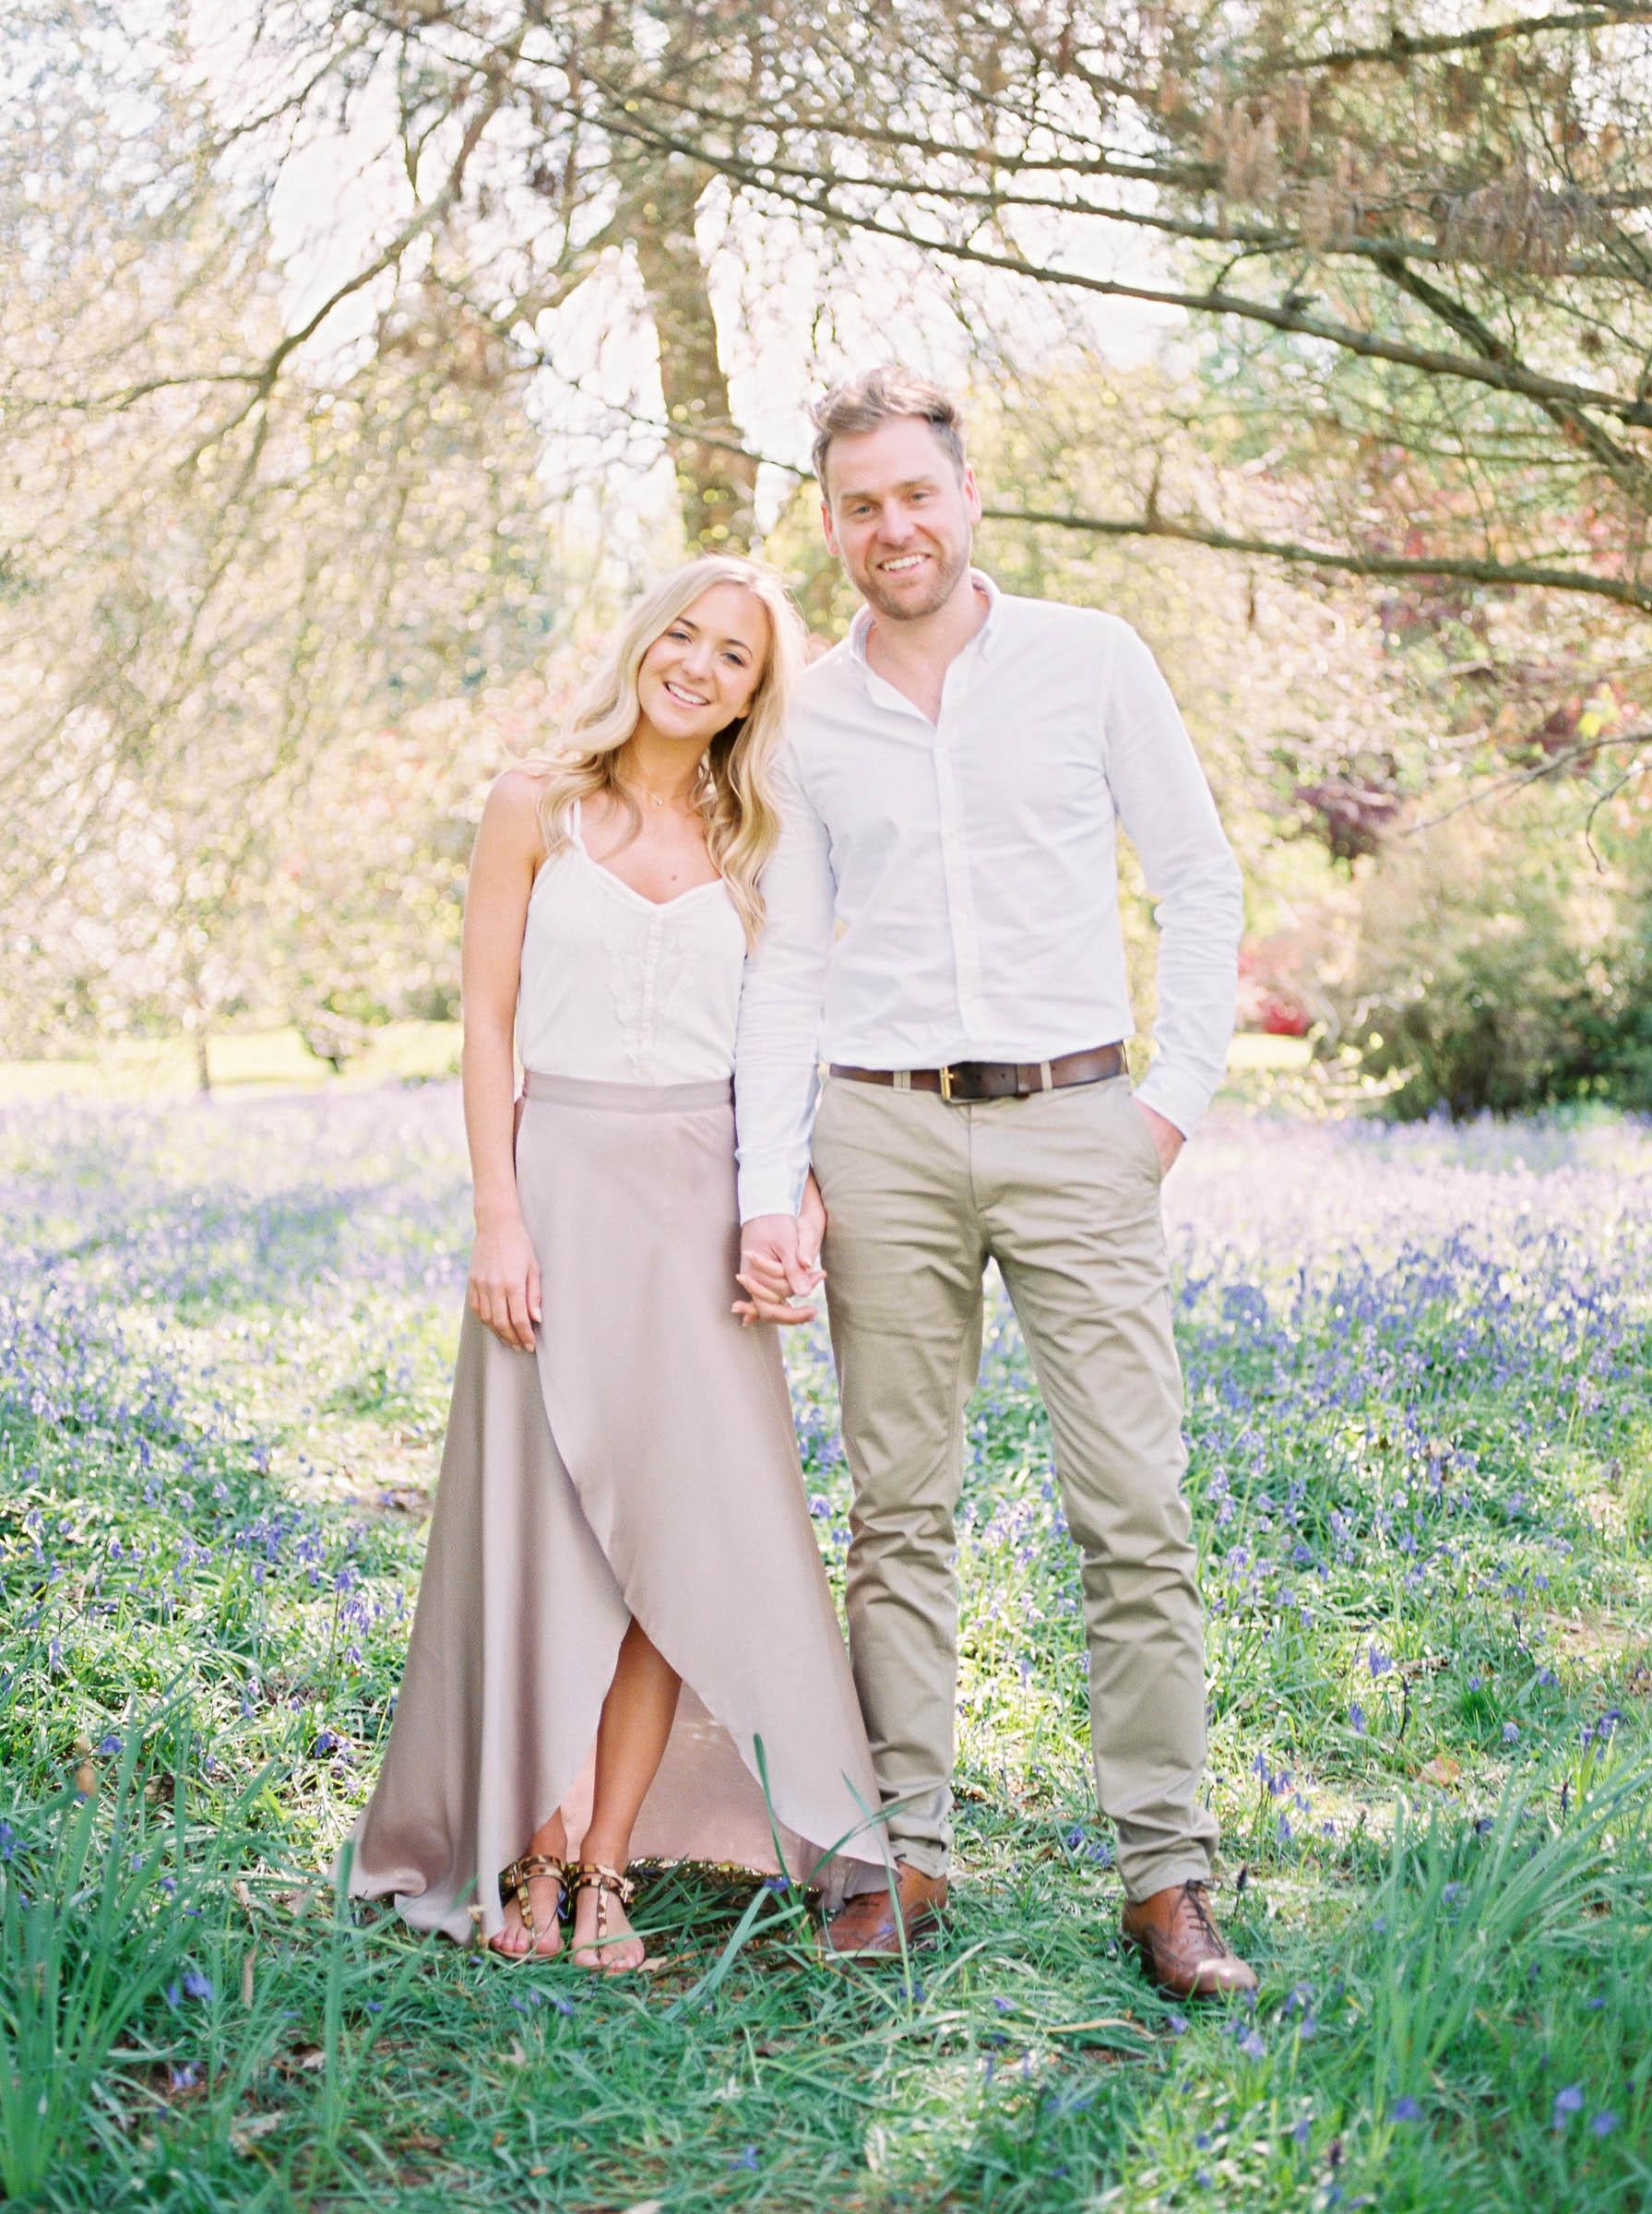 Amy O'Boyle Photography- Destination & UK Fine Art Film Wedding Photographer- Sheffield Park Garden National Trust Spring Engagement Shoot-18.jpg